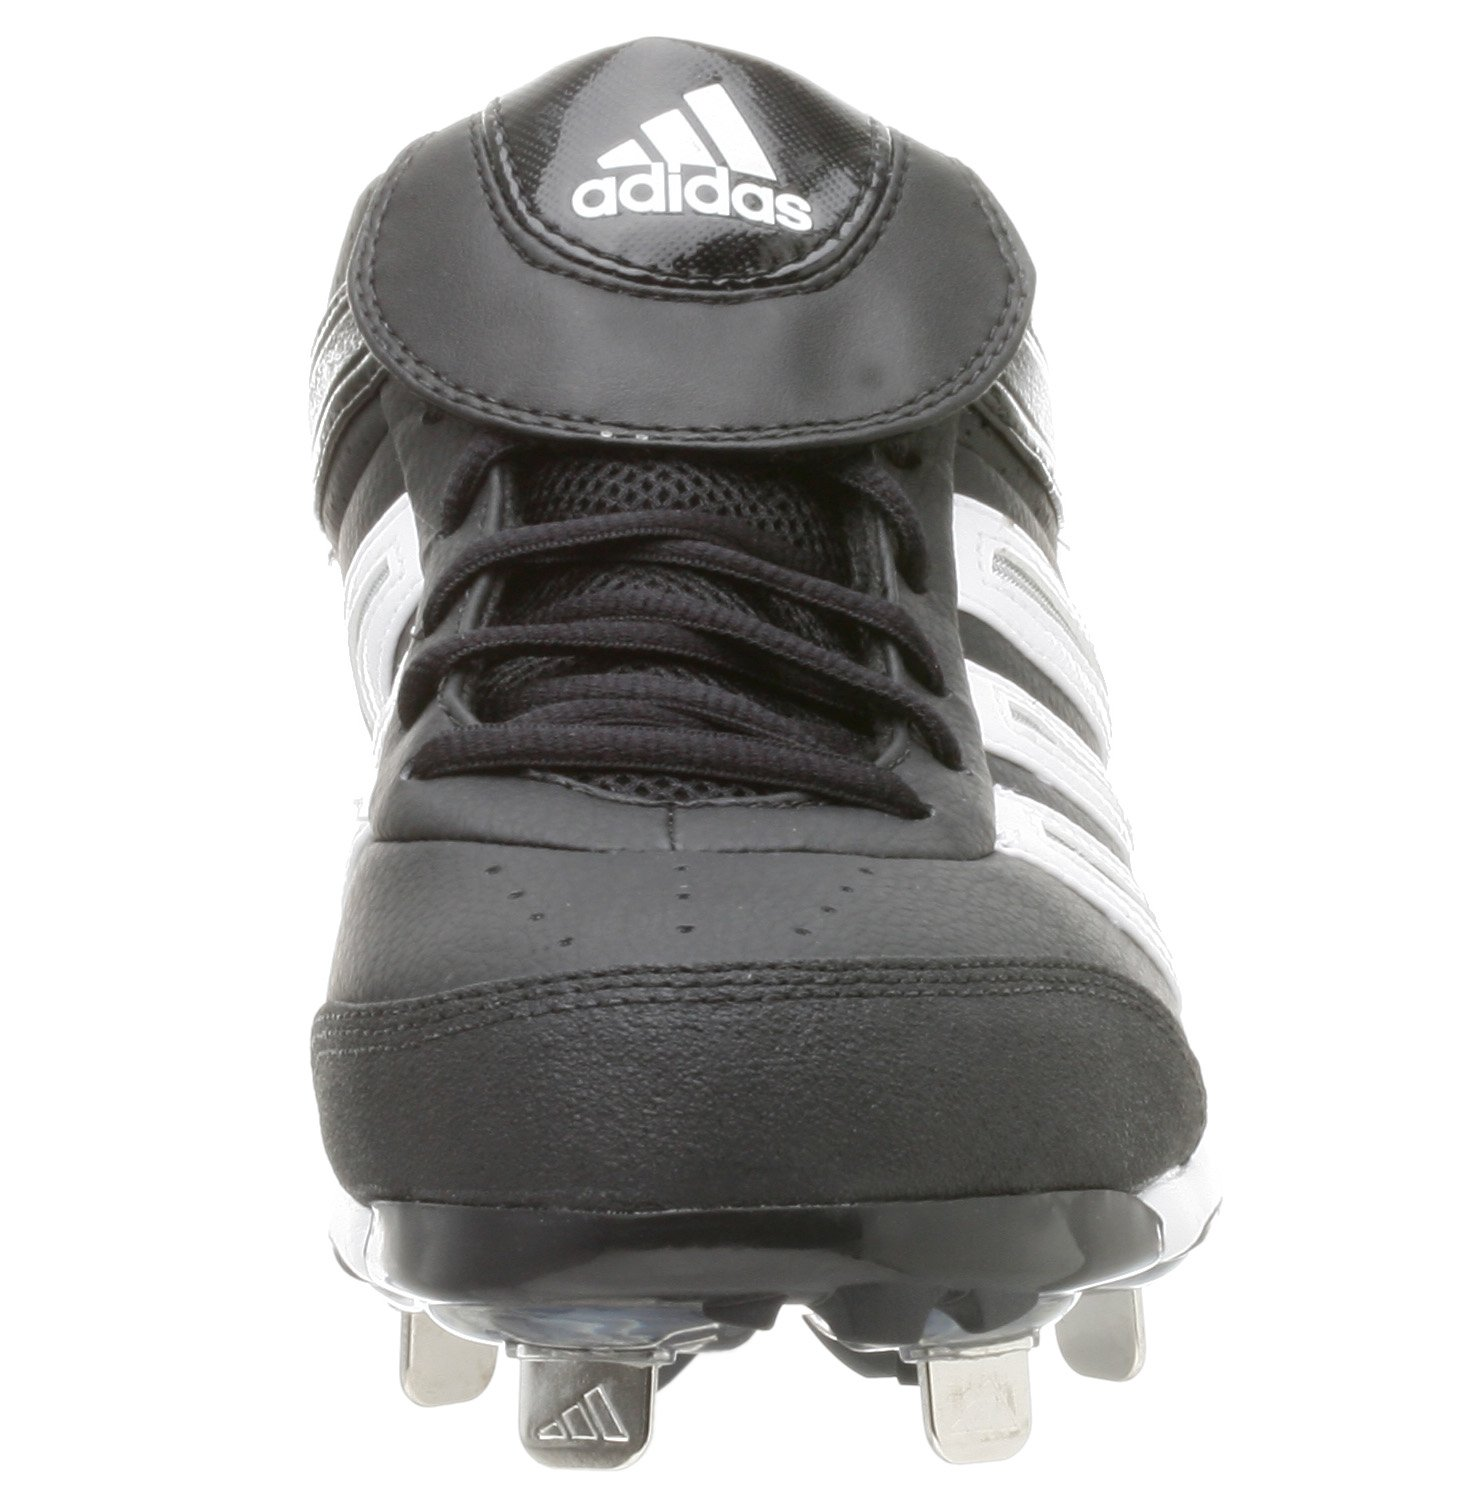 adidas Men's Diamond King Low Baseball Shoe,Blk/Runwht/Metsil,9.5 M by adidas (Image #5)